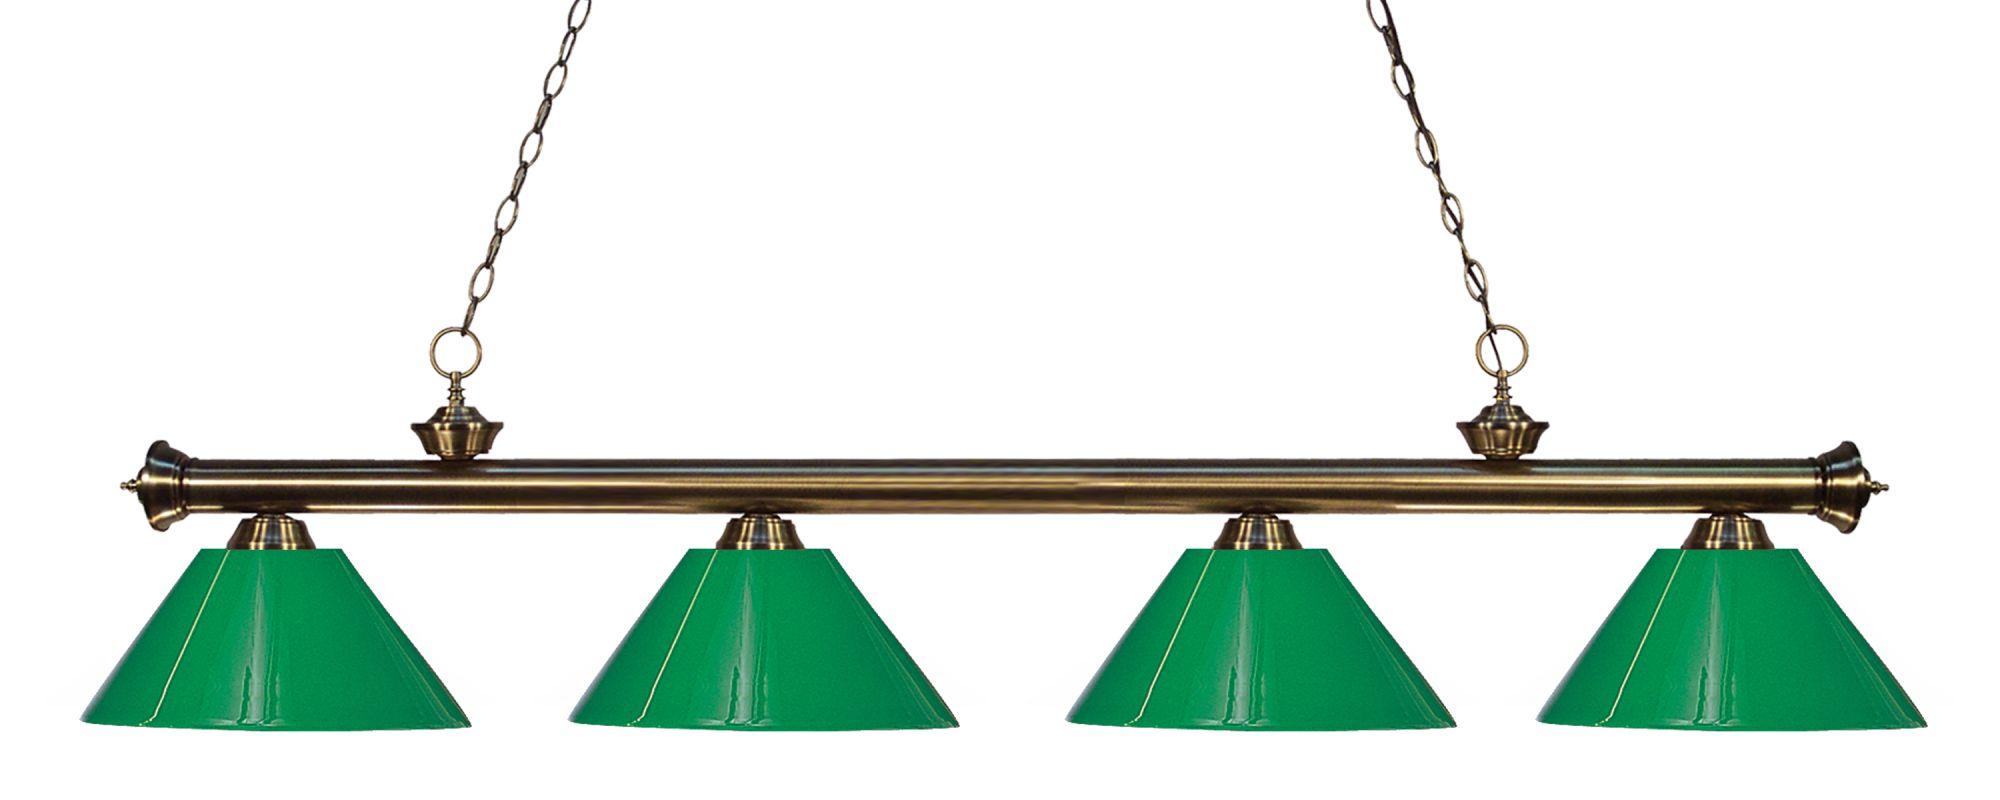 Z-Lite 200-4-PGR Riviera 4 Light Island/Billiard Light with Green Sale $398.00 ITEM: bci2564568 ID#:200-4AB-PGR UPC: 685659040937 :